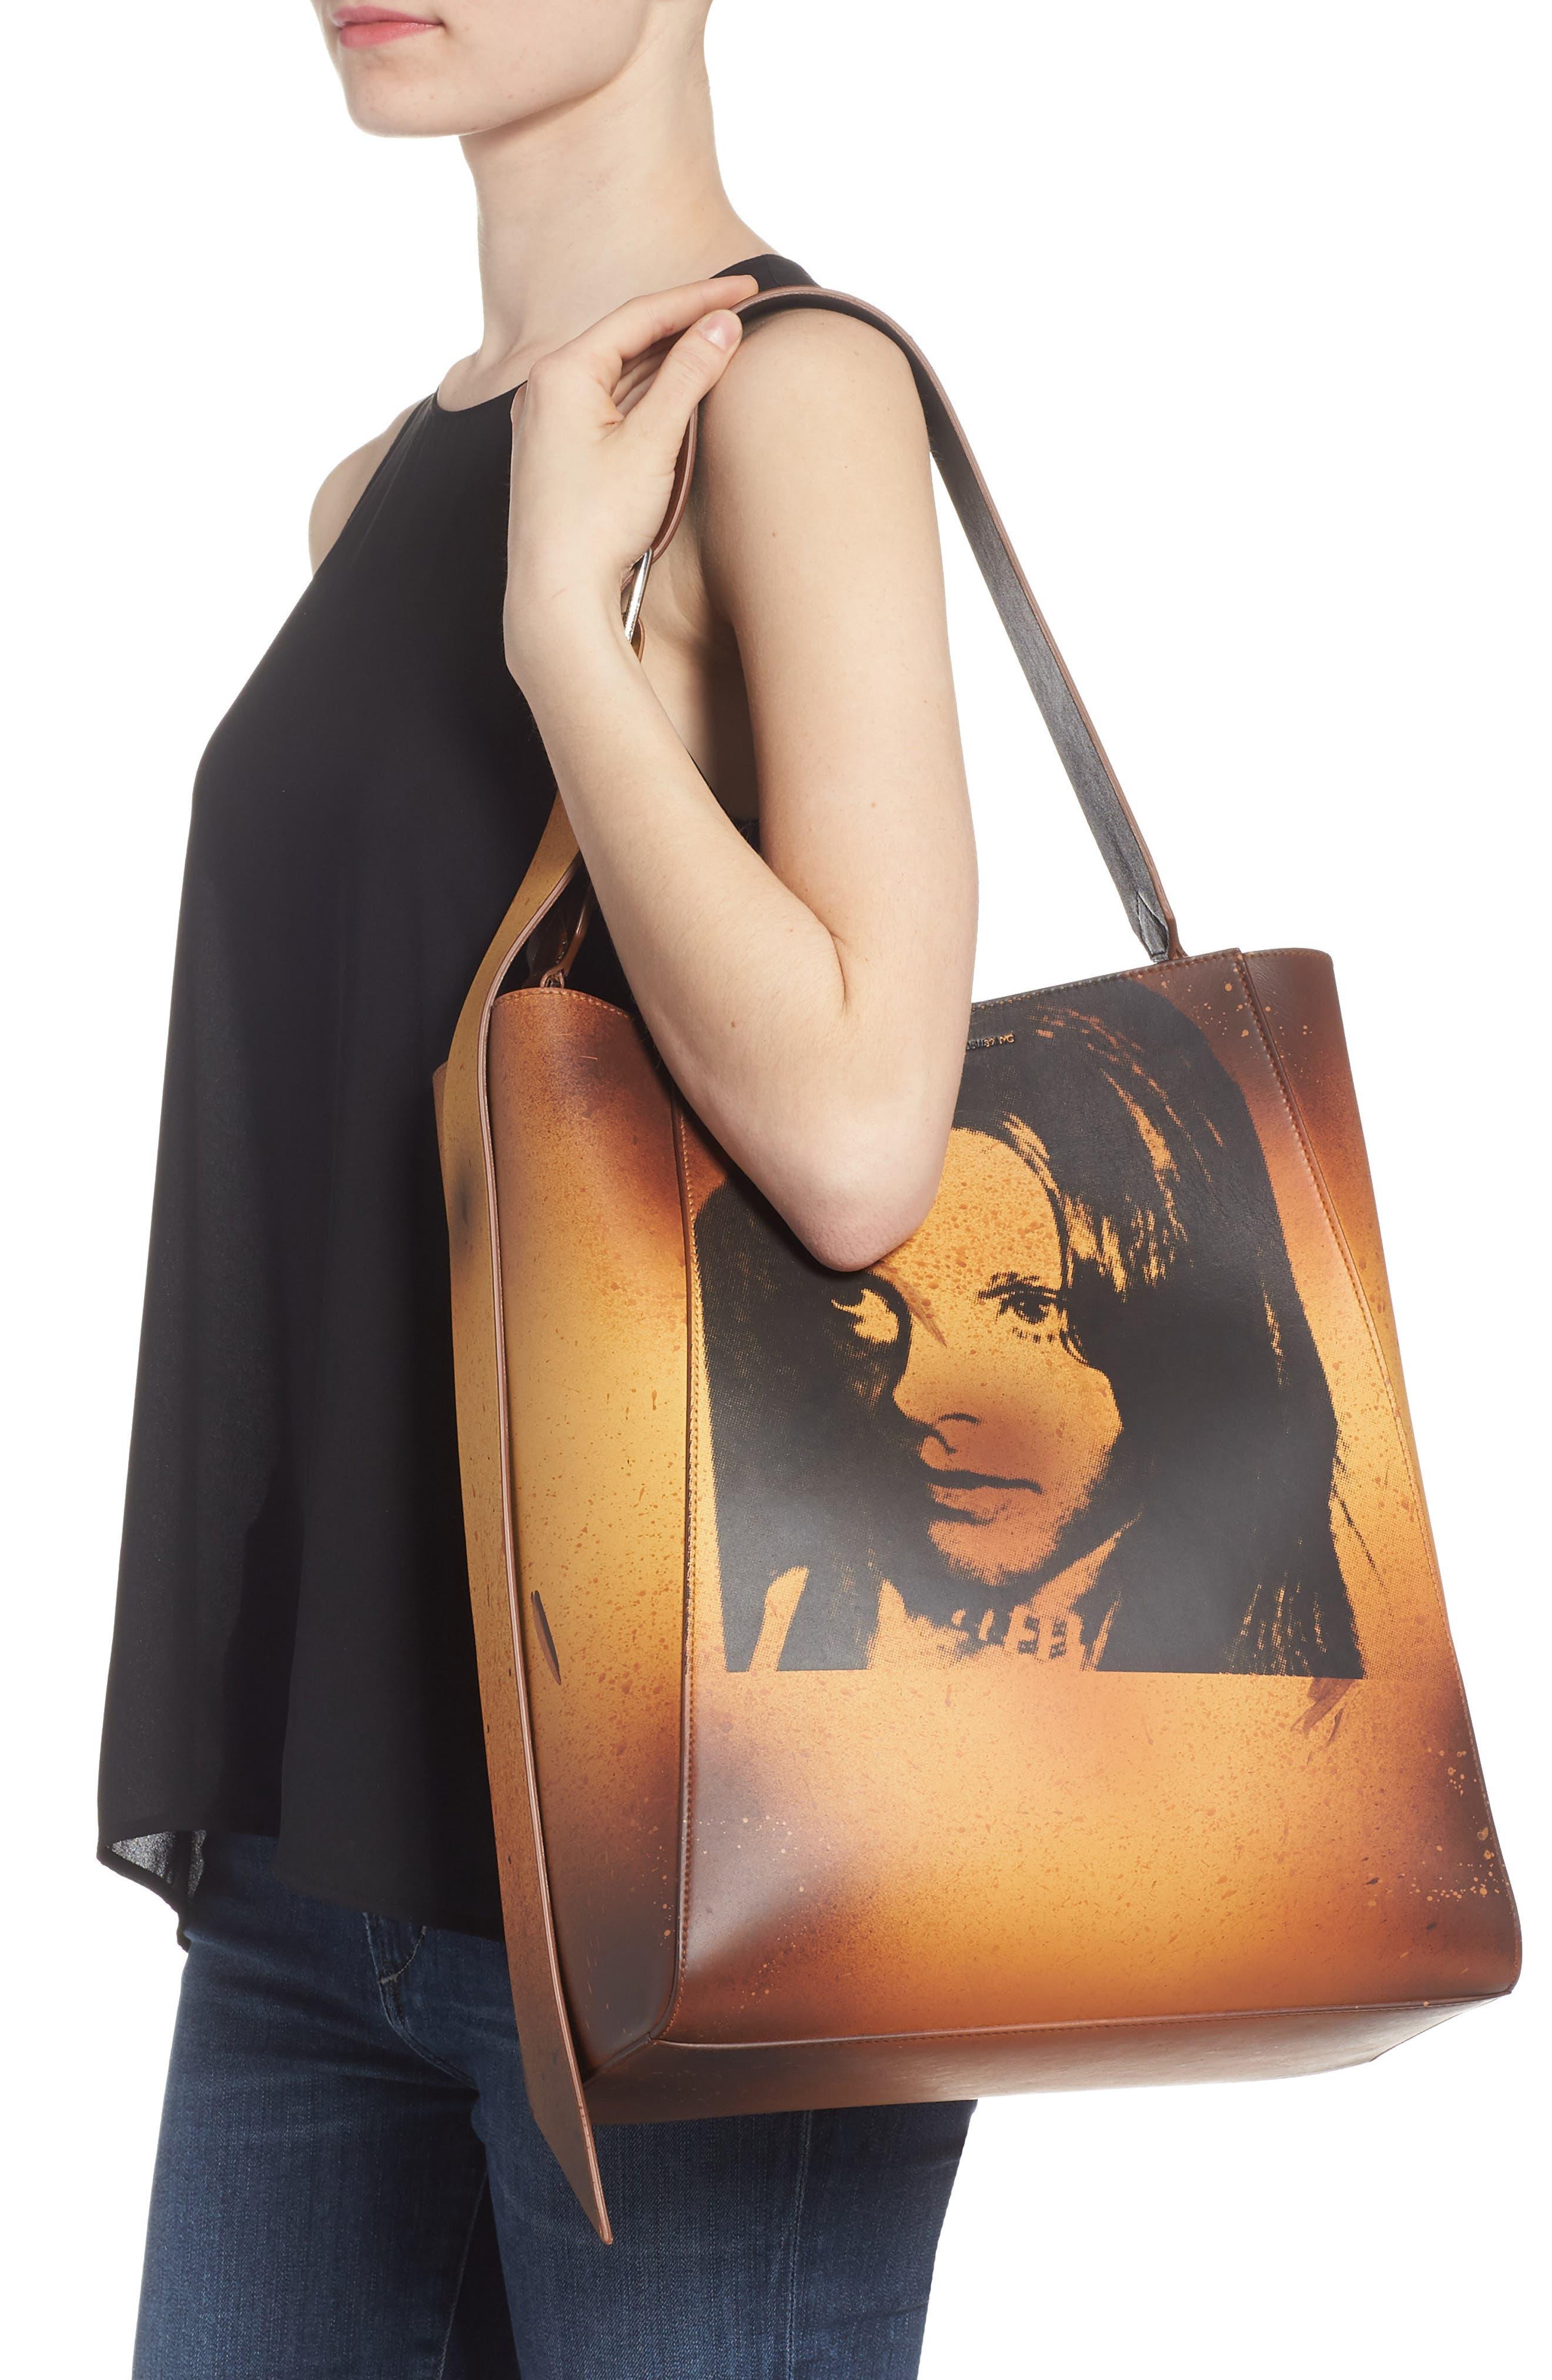 x Andy Warhol Foundation Sandra Brant Calfskin Leather Bucket Bag,                             Alternate thumbnail 2, color,                             AMBER/ BLACK